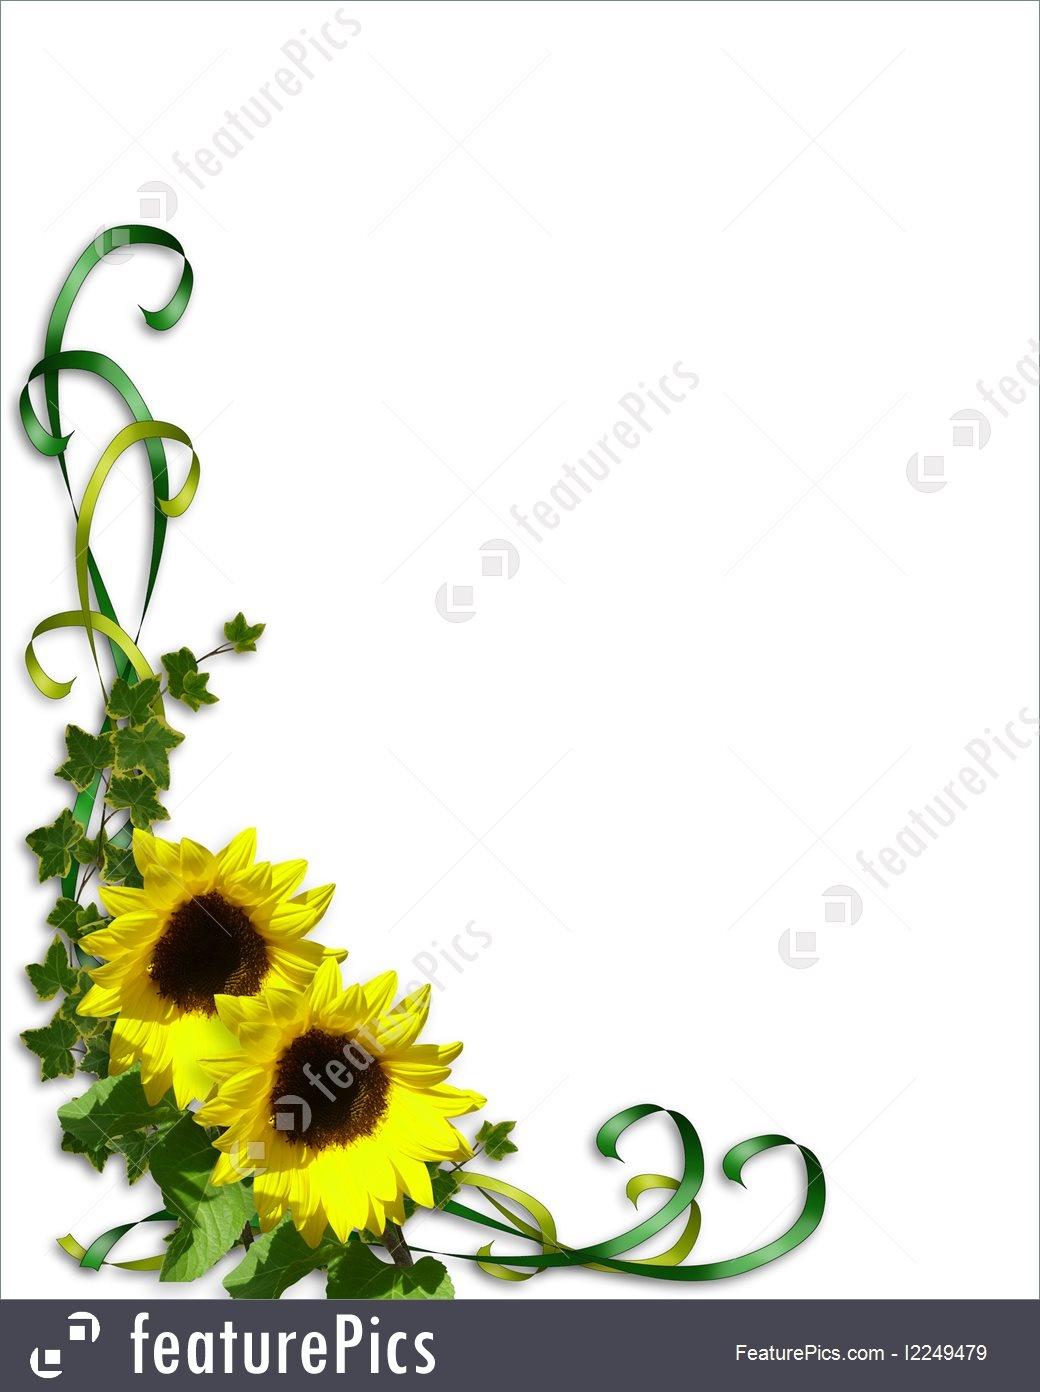 Templates: Sunflowers Wedding Invitation Template - Stock - Free Printable Sunflower Wedding Invitation Templates